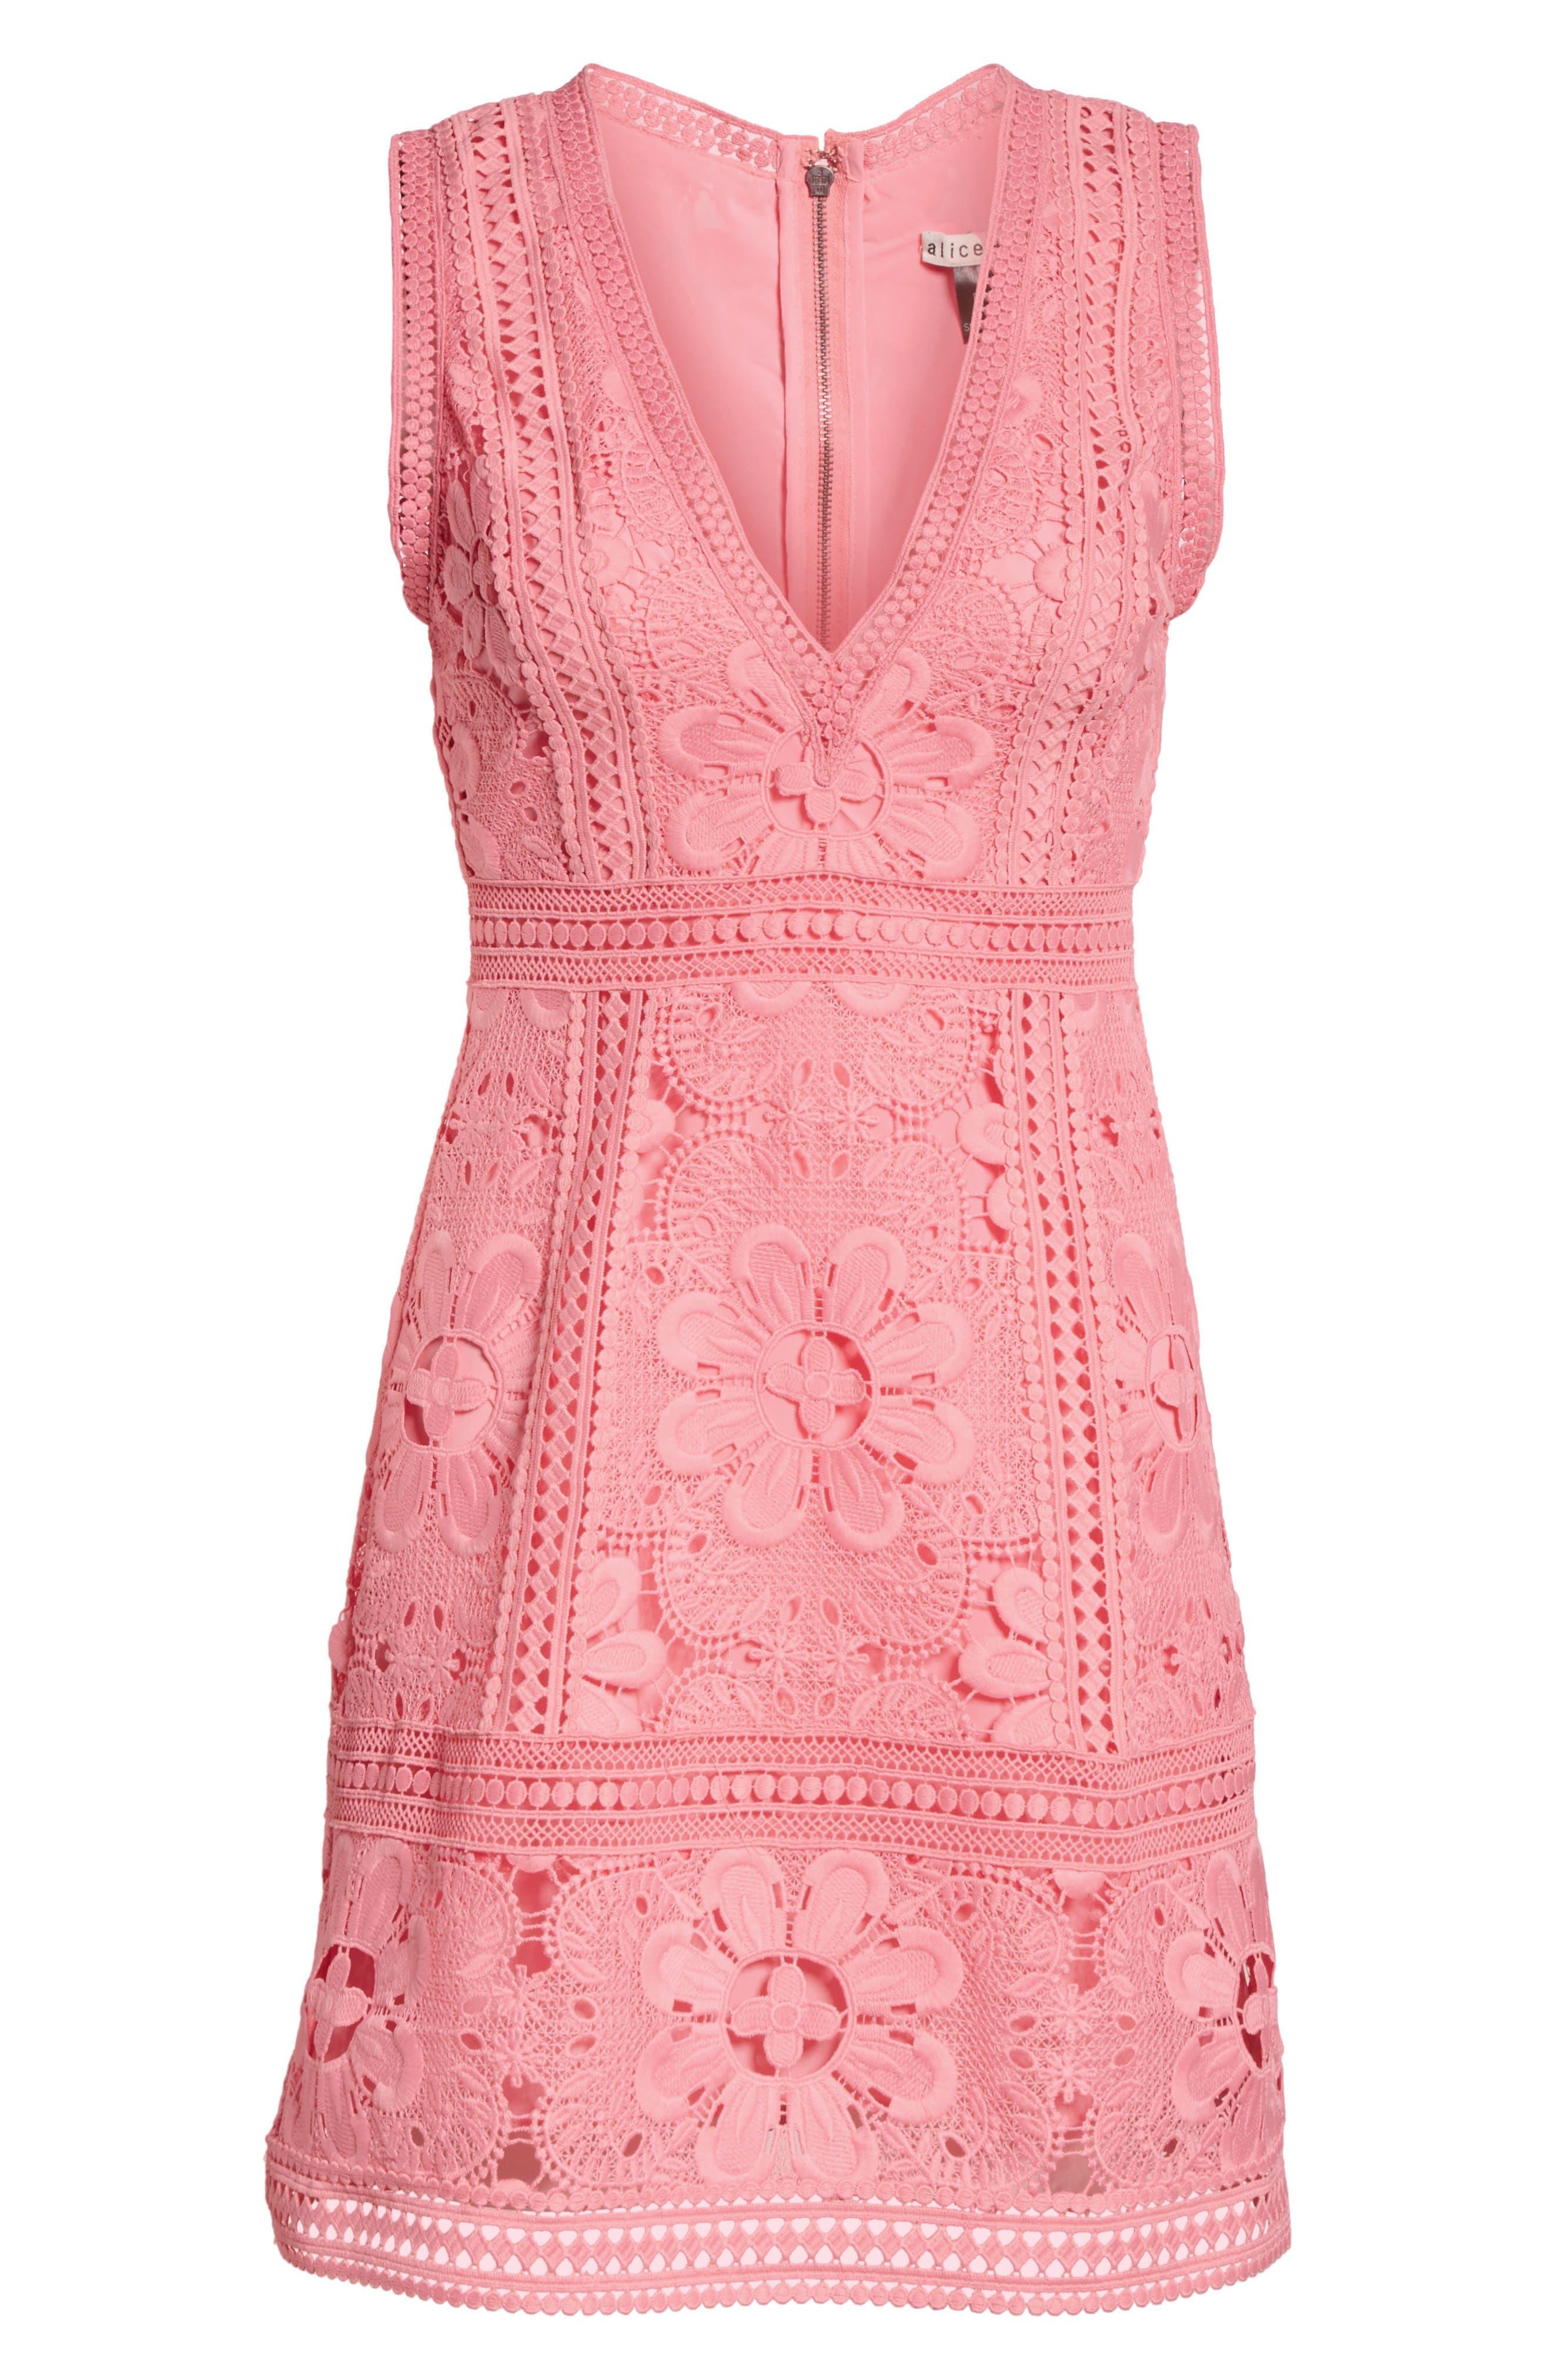 Zula Lace Minidress,                             Alternate thumbnail 6, color,                             Blossom